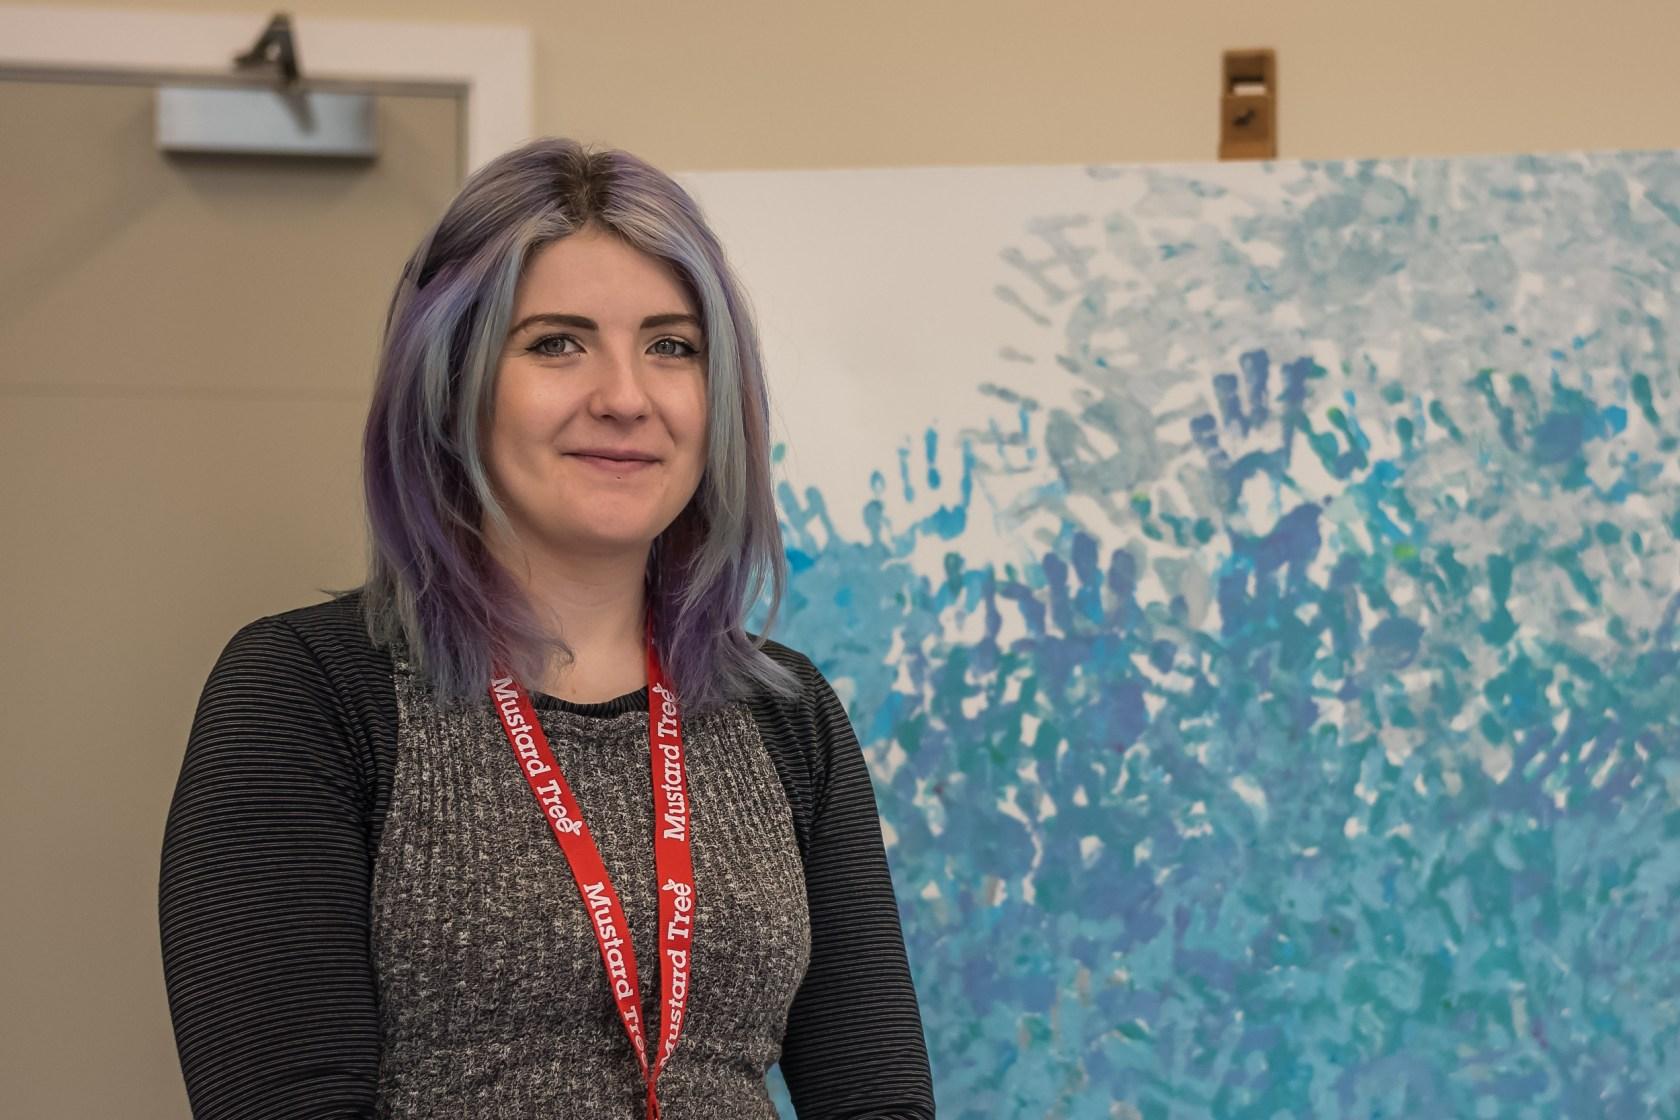 Anoushka Gordon - Creative Programs Manager